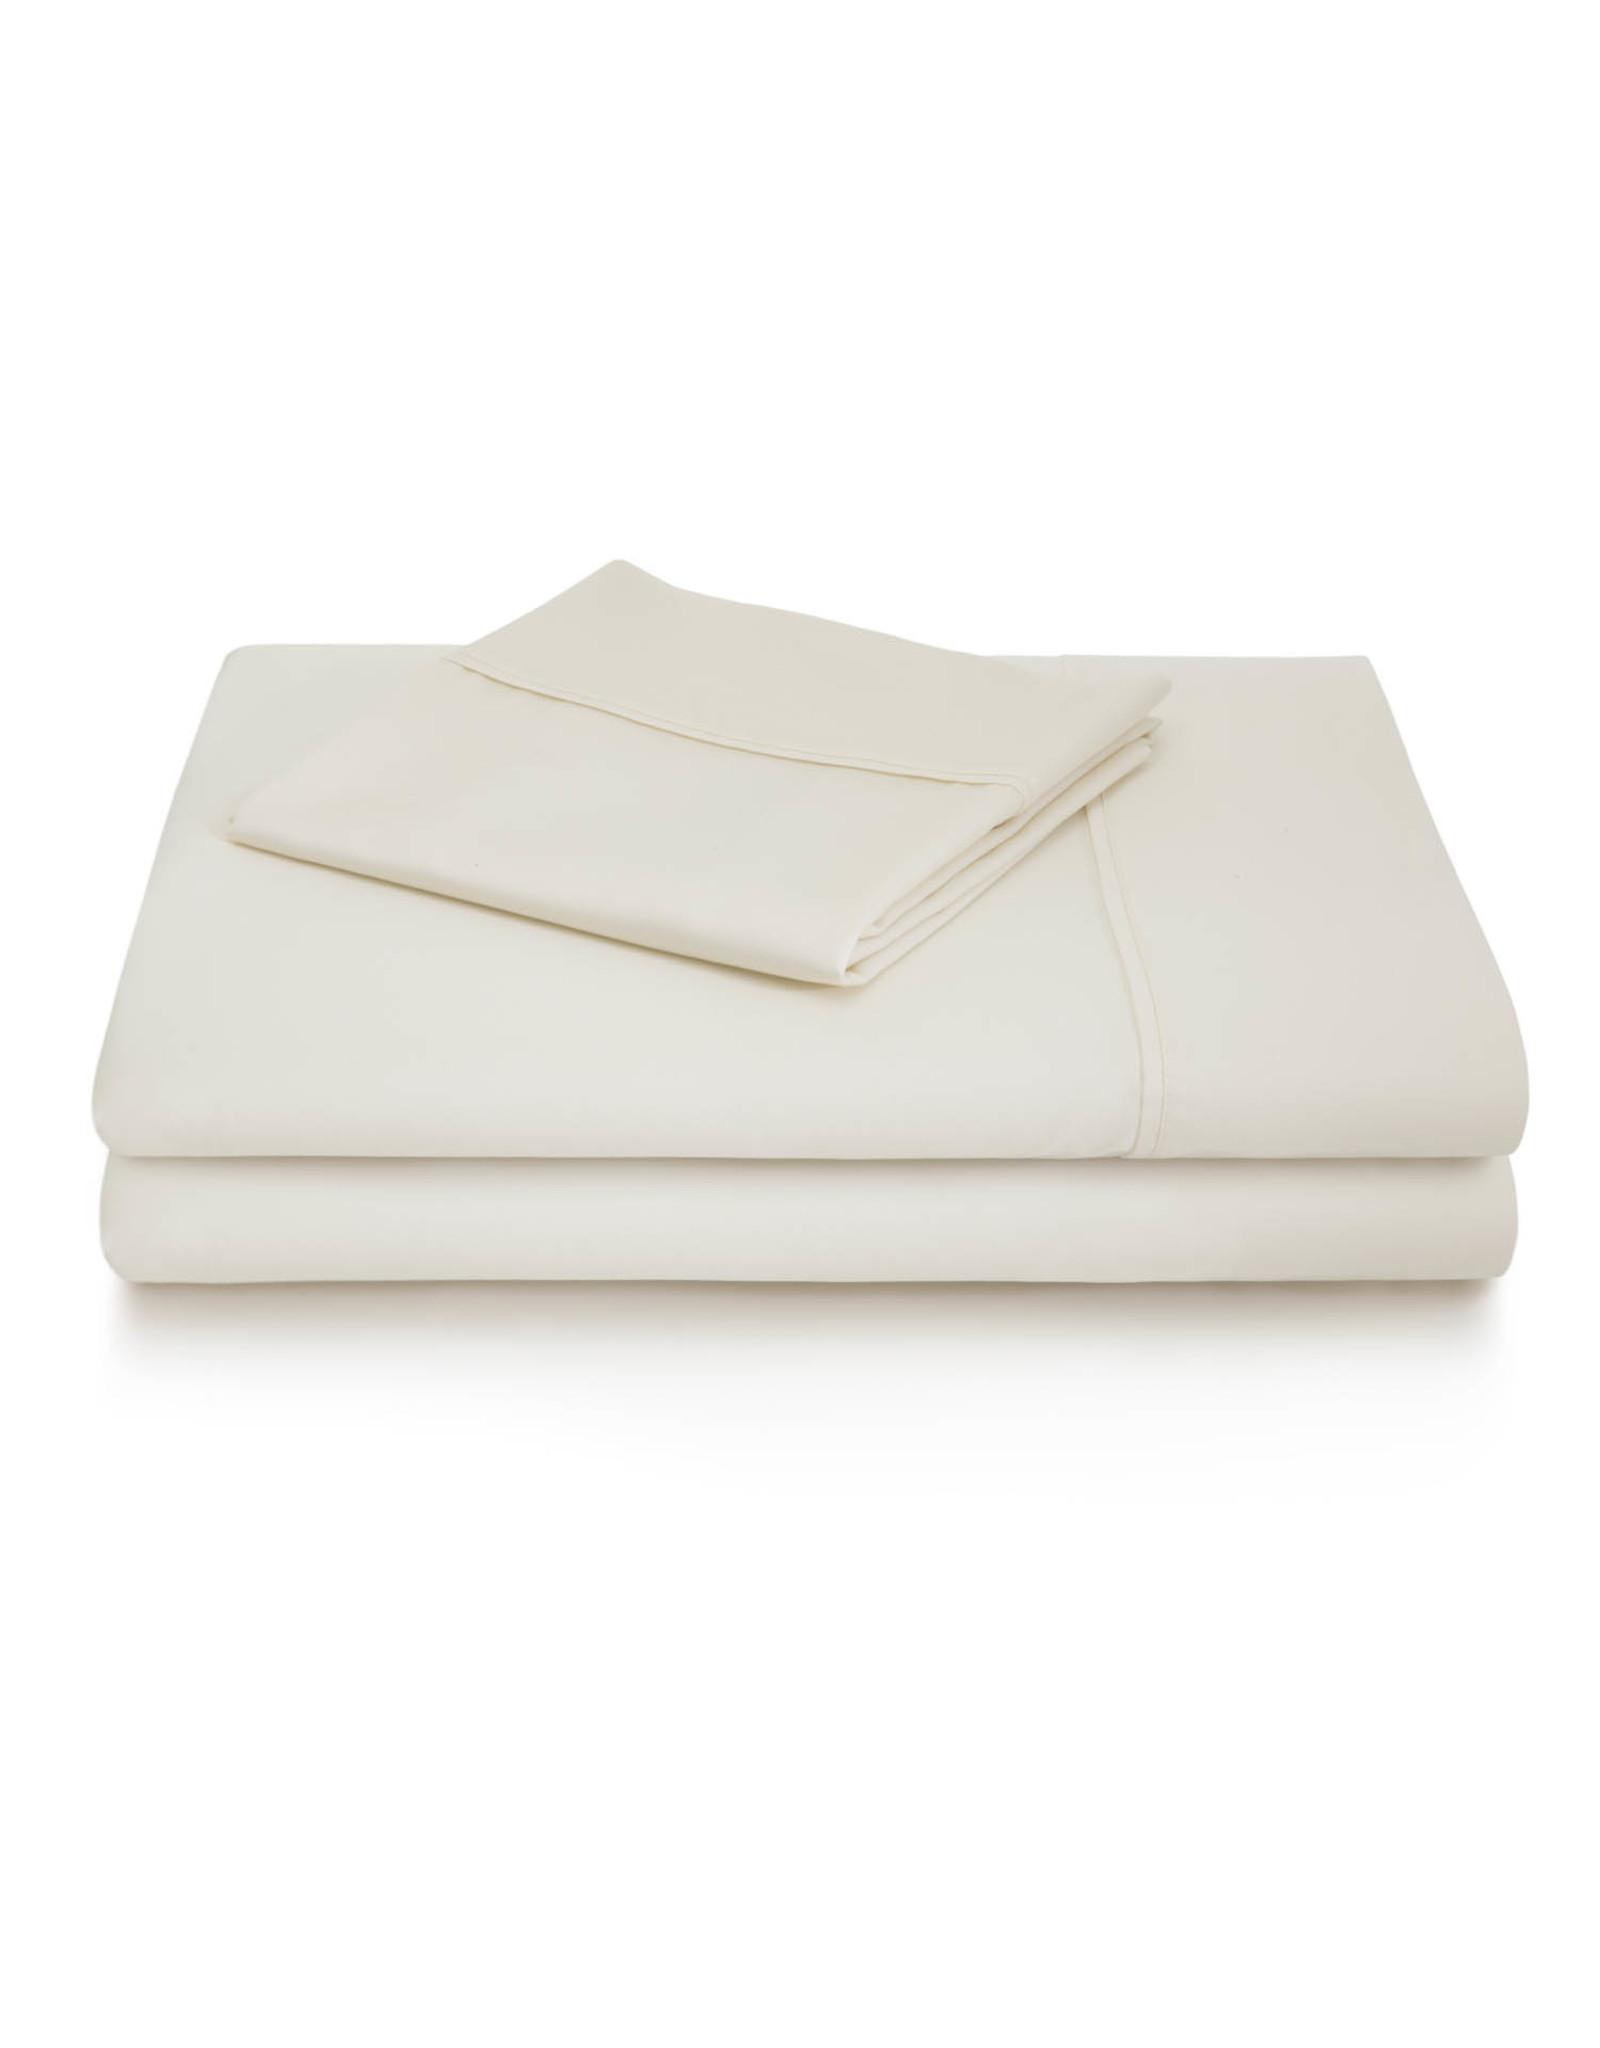 Malouf 600TC Sheets - King - White